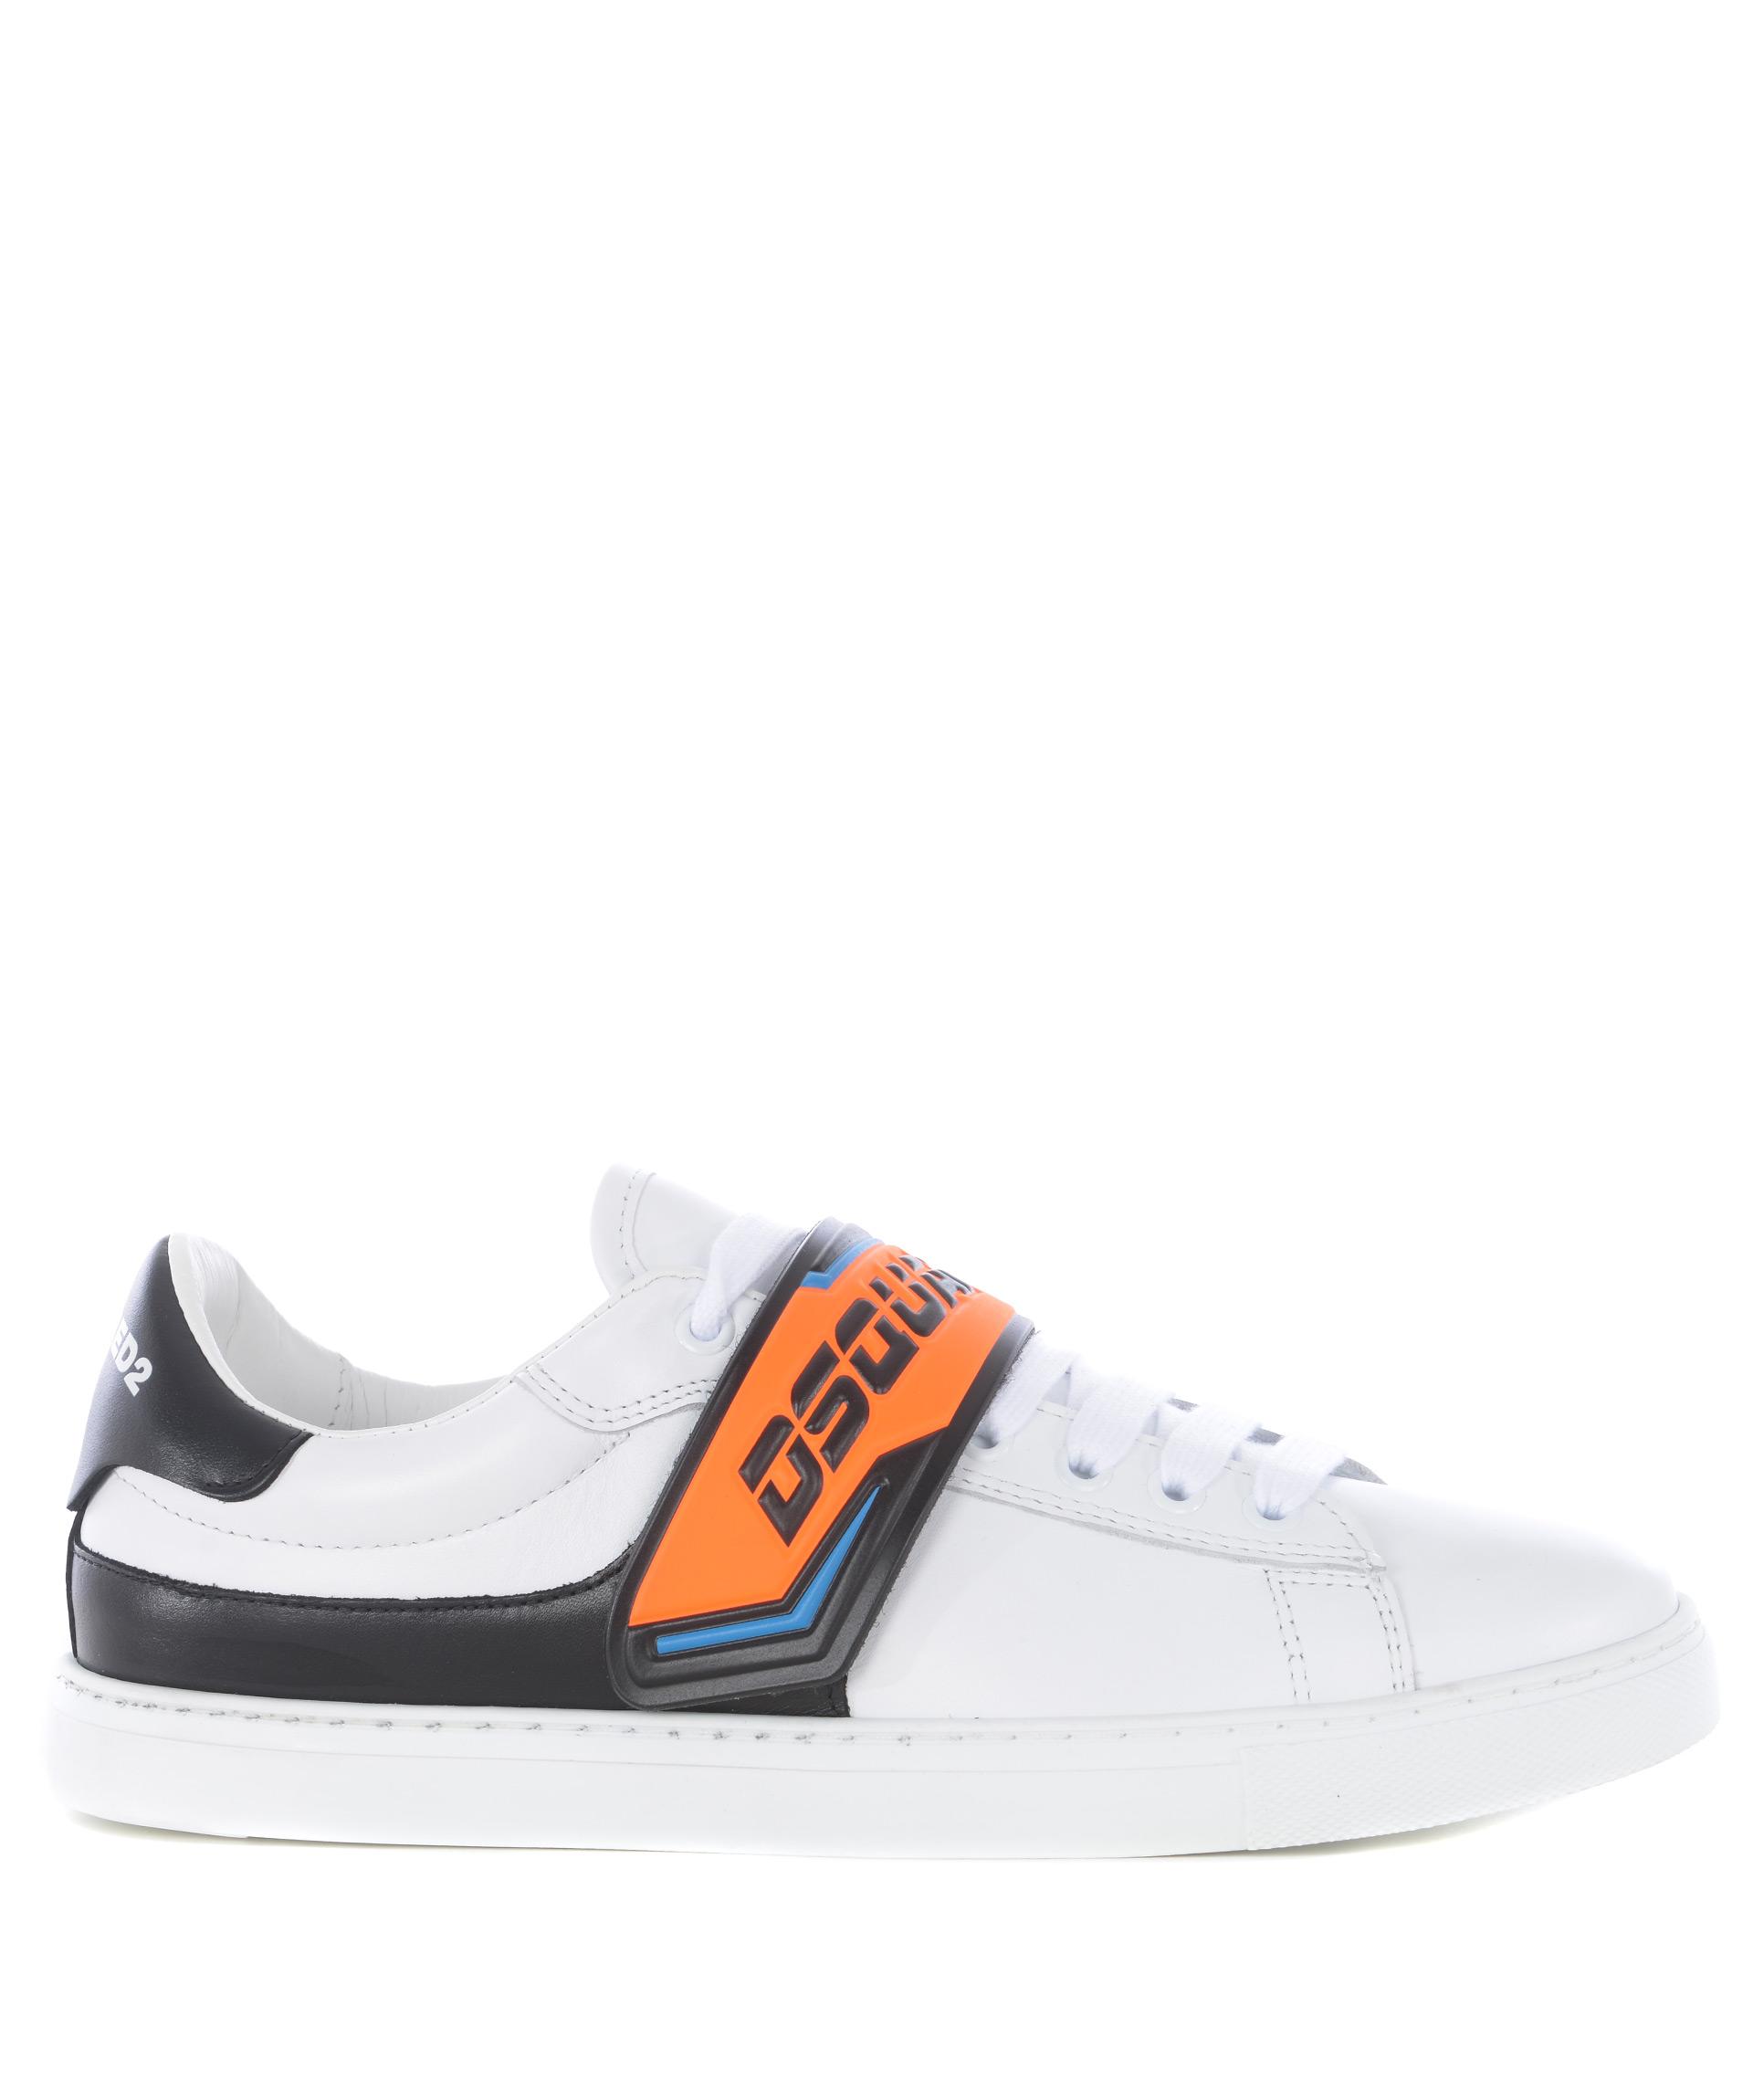 quality design 06de9 93096 Sneakers uomo Dsquared2